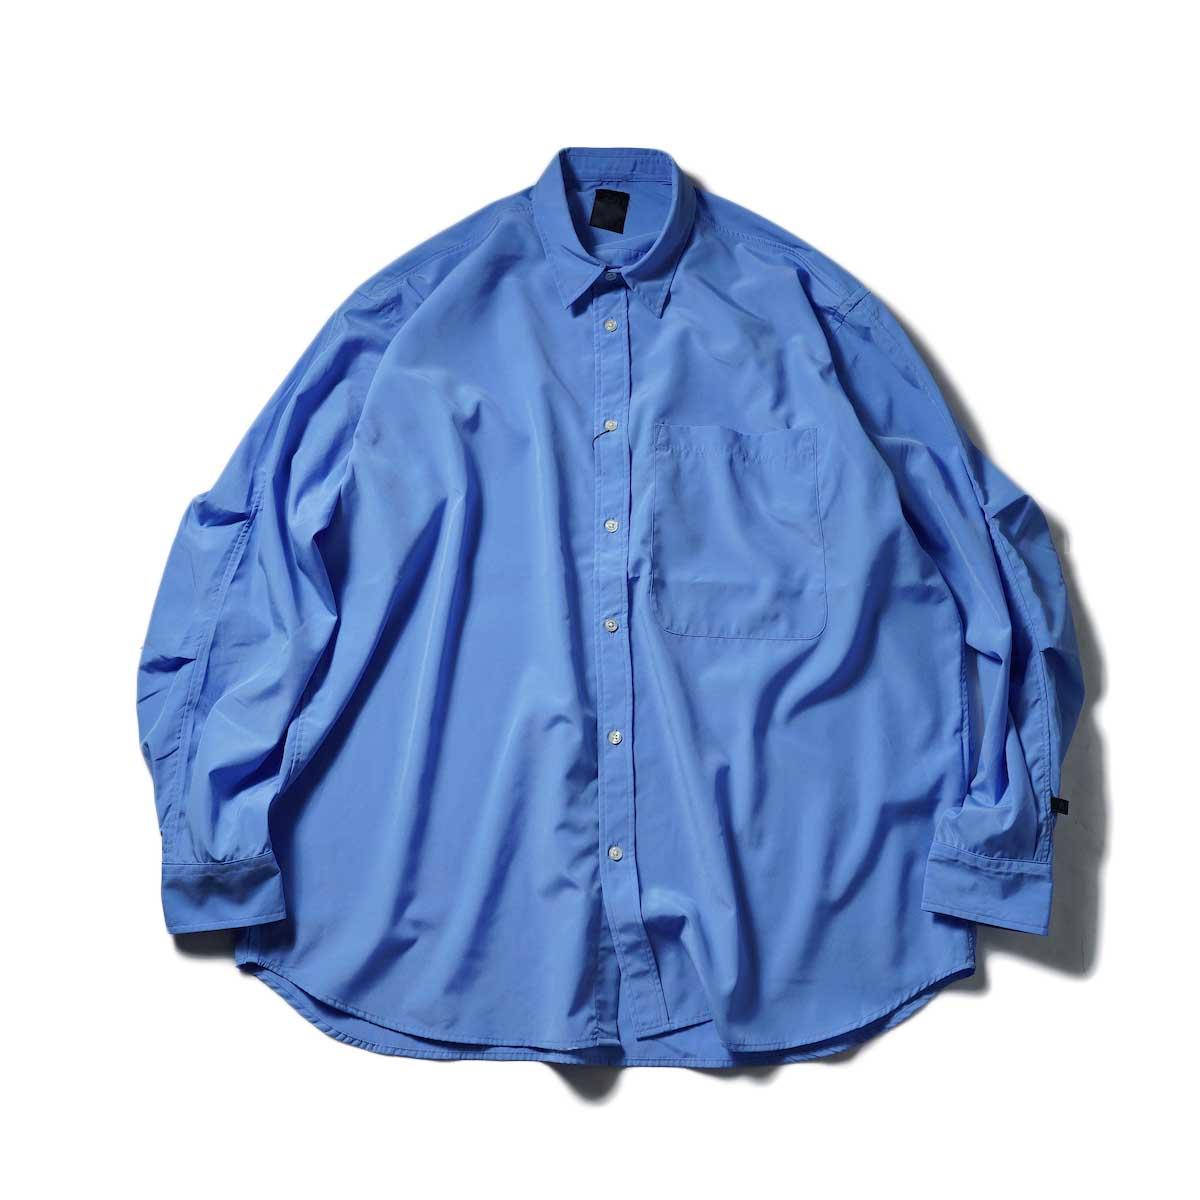 DAIWA PIER39 / Tech Regullar Collar Shirt (Blue)